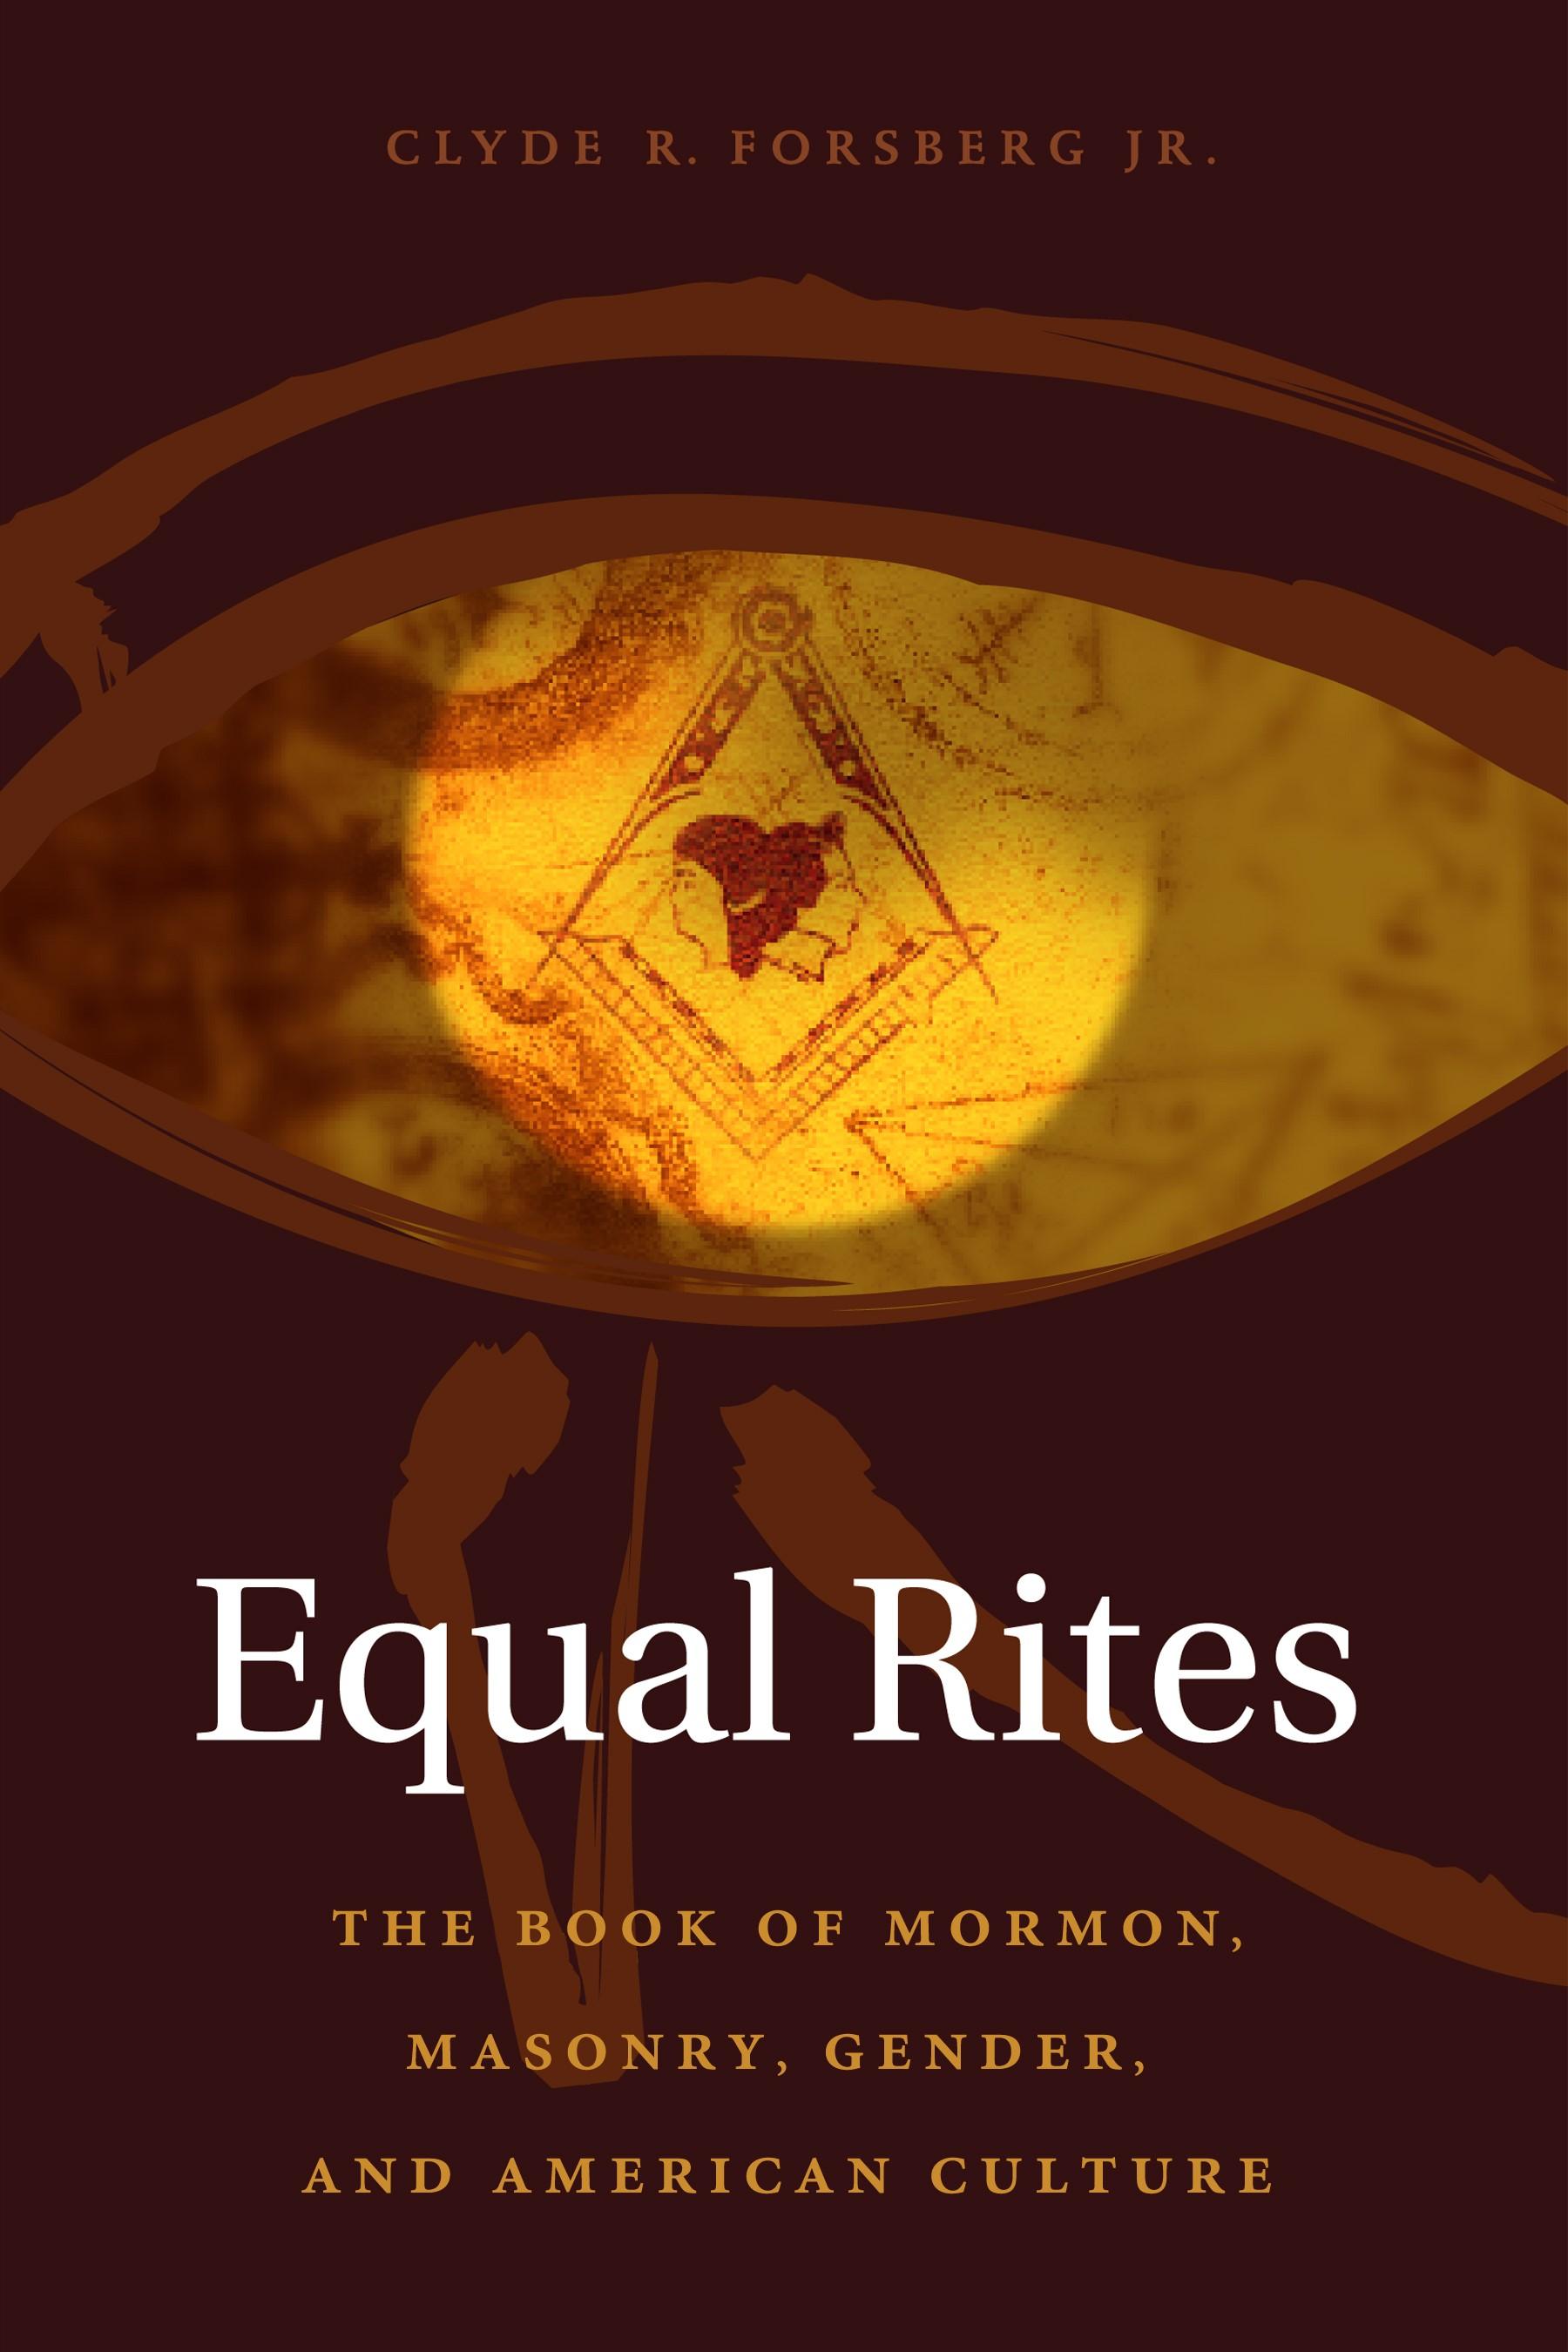 Abbildung von Forsberg Jr. | Equal Rites | 2004